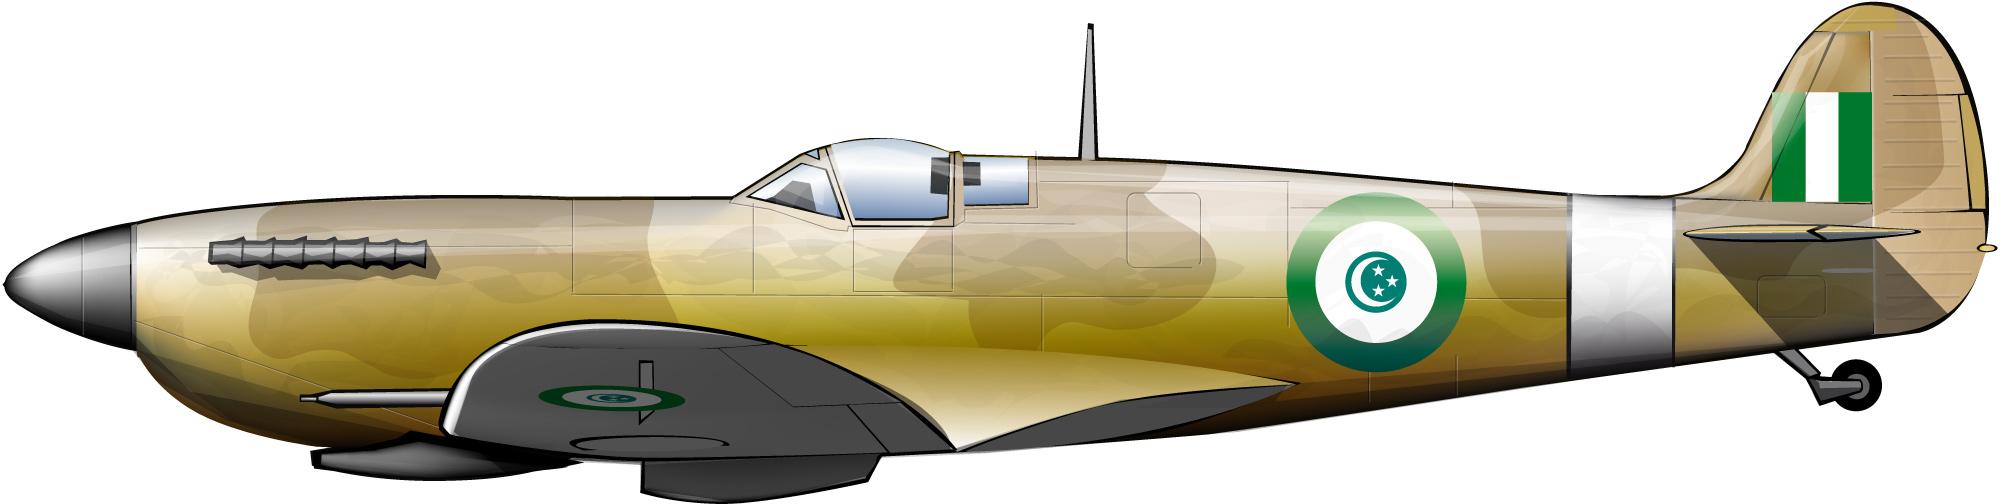 supermarinespitfireegipto19